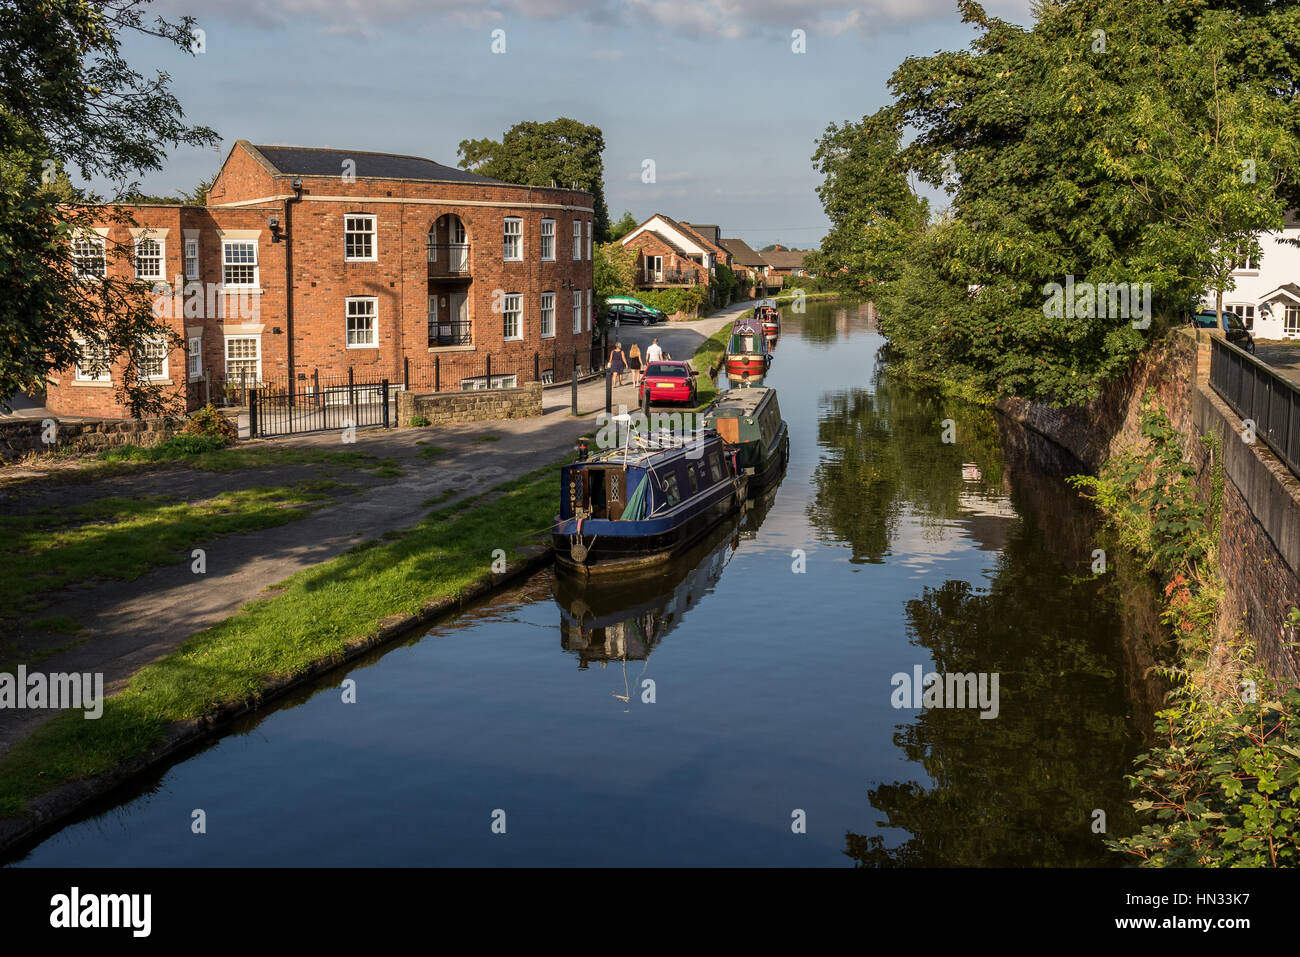 Bridgewater Canal at Lymm, Cheshire, UK - Stock Image